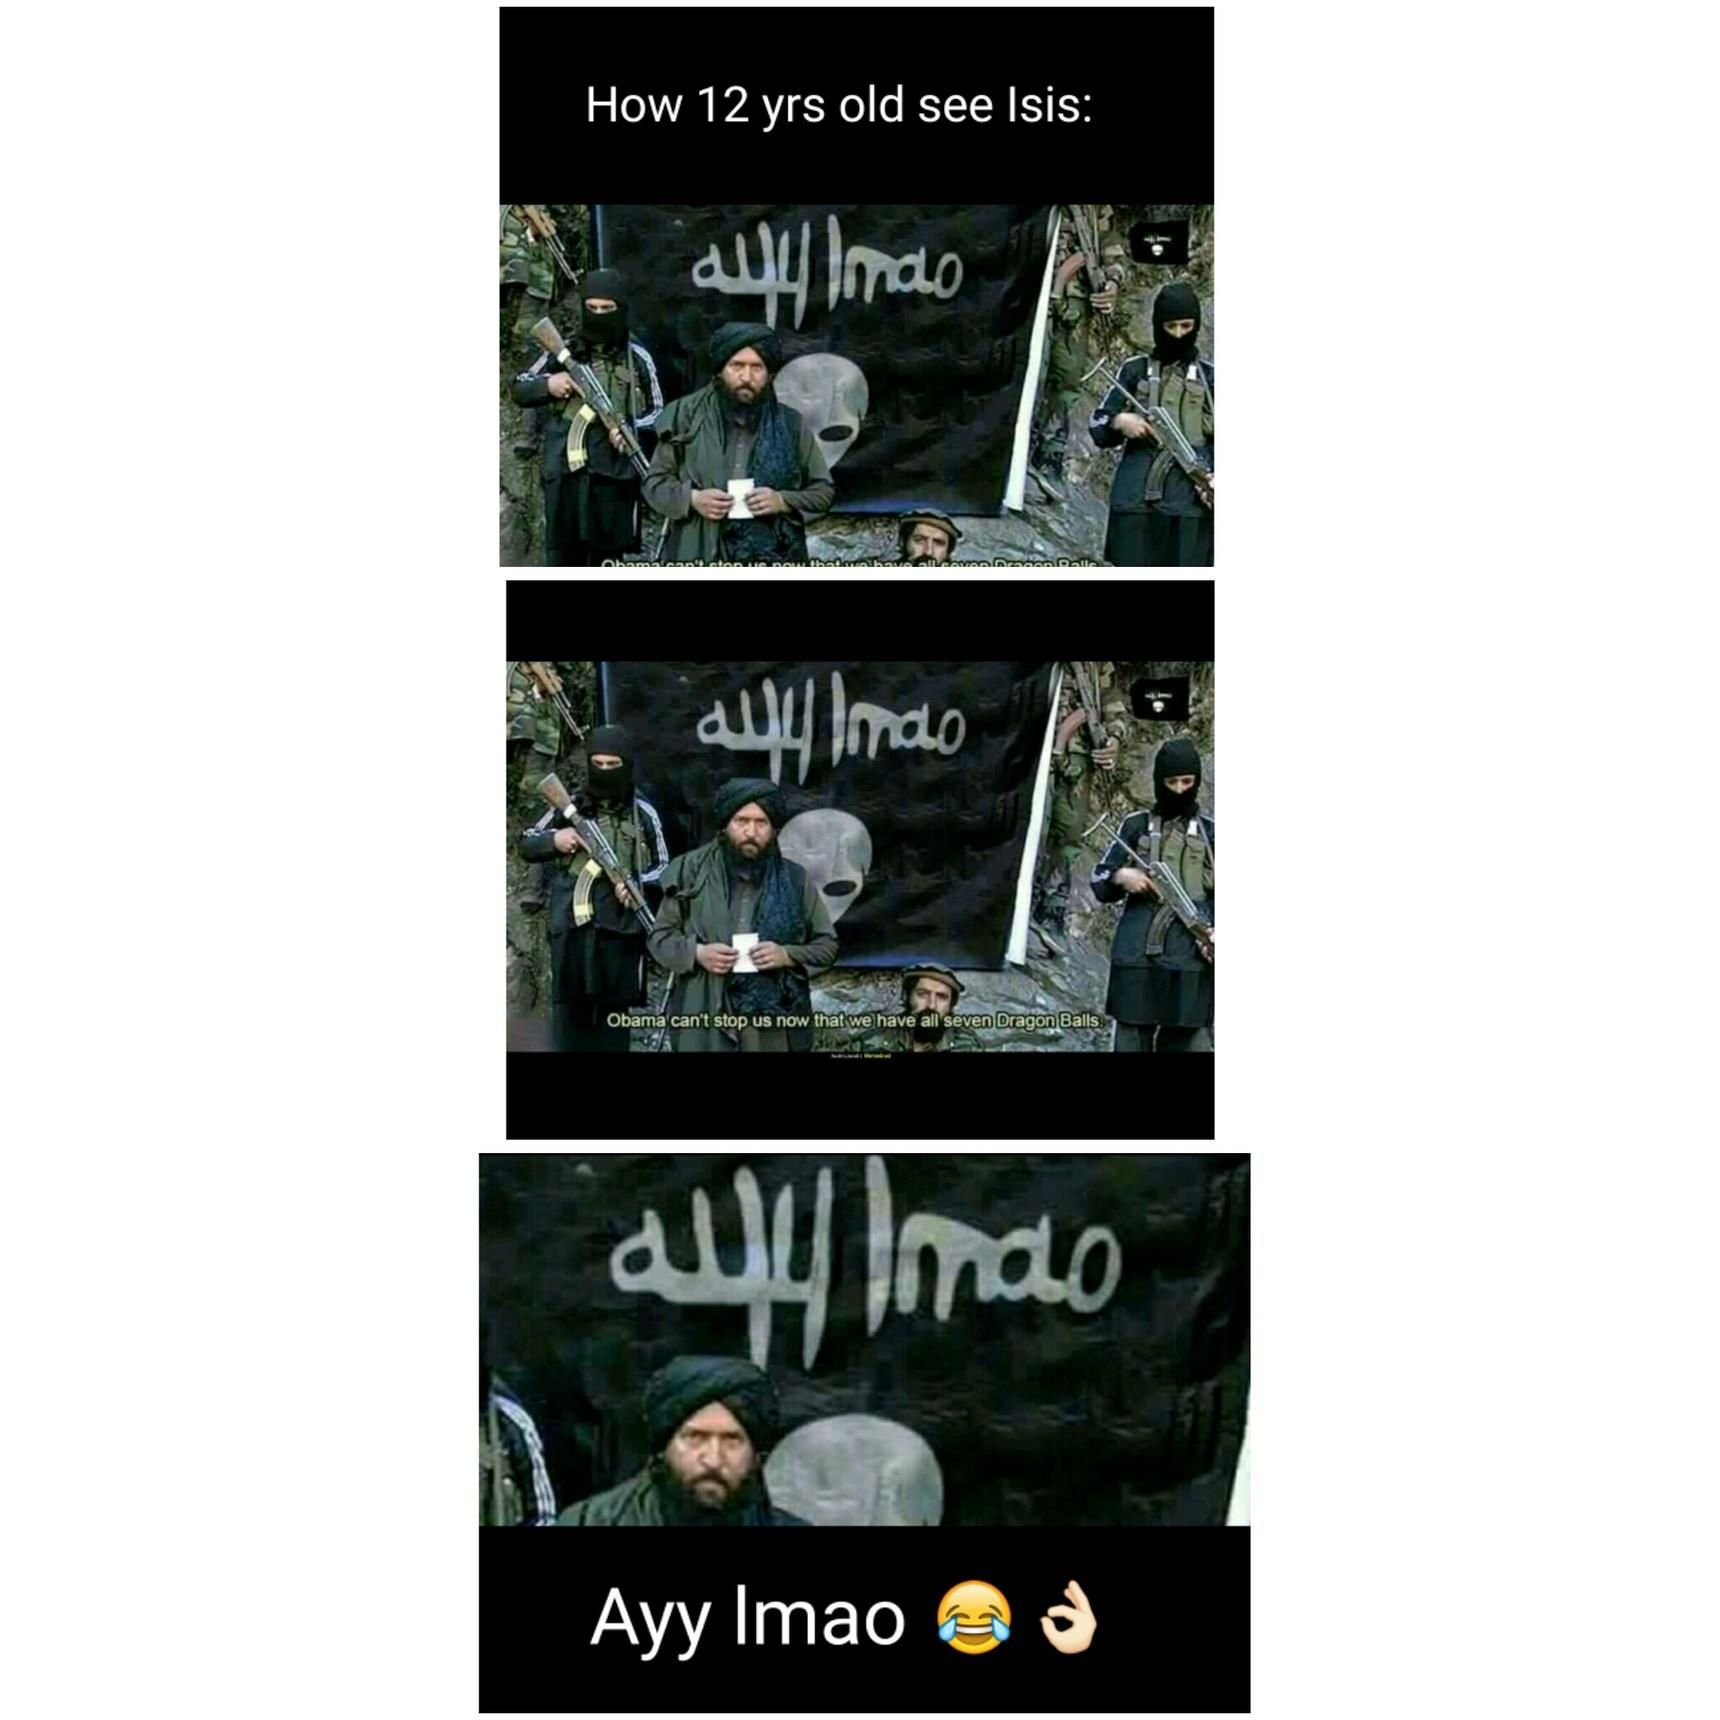 'Dem terrorists - meme